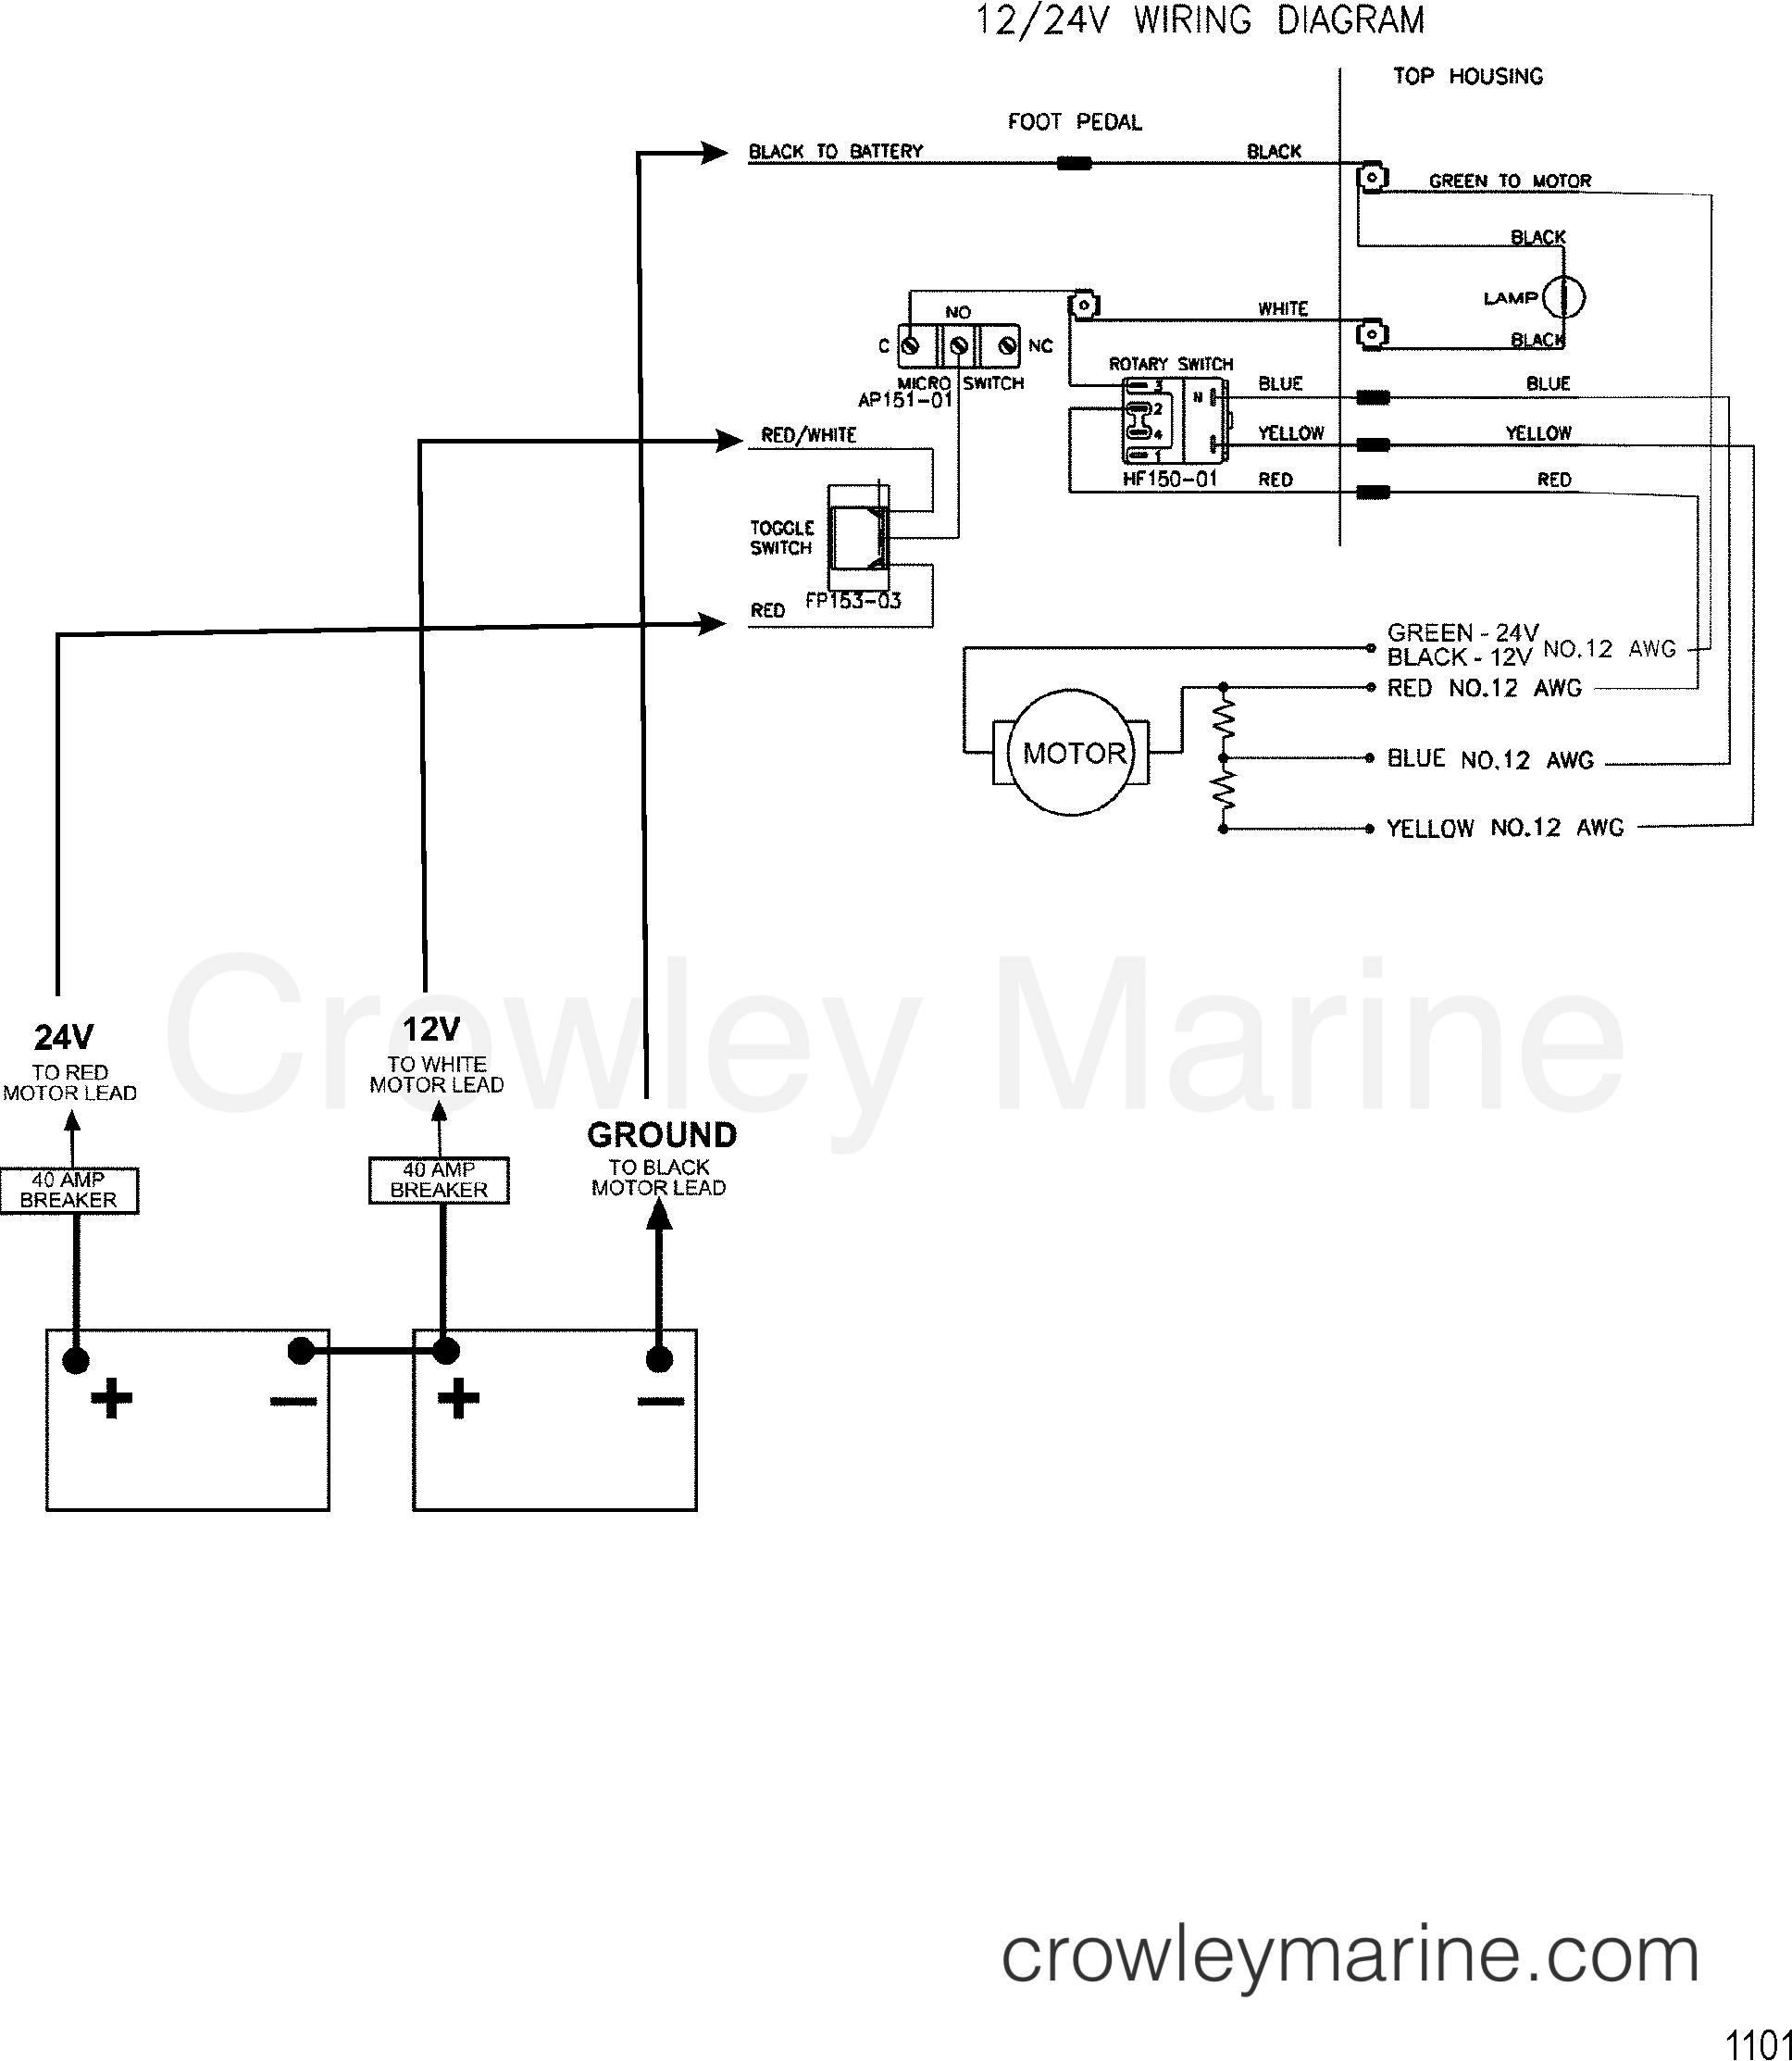 1999 MotorGuide [MOTORGUIDE] - 9767B4HV7 - WIRE DIAGRAM(MODEL 767) (24